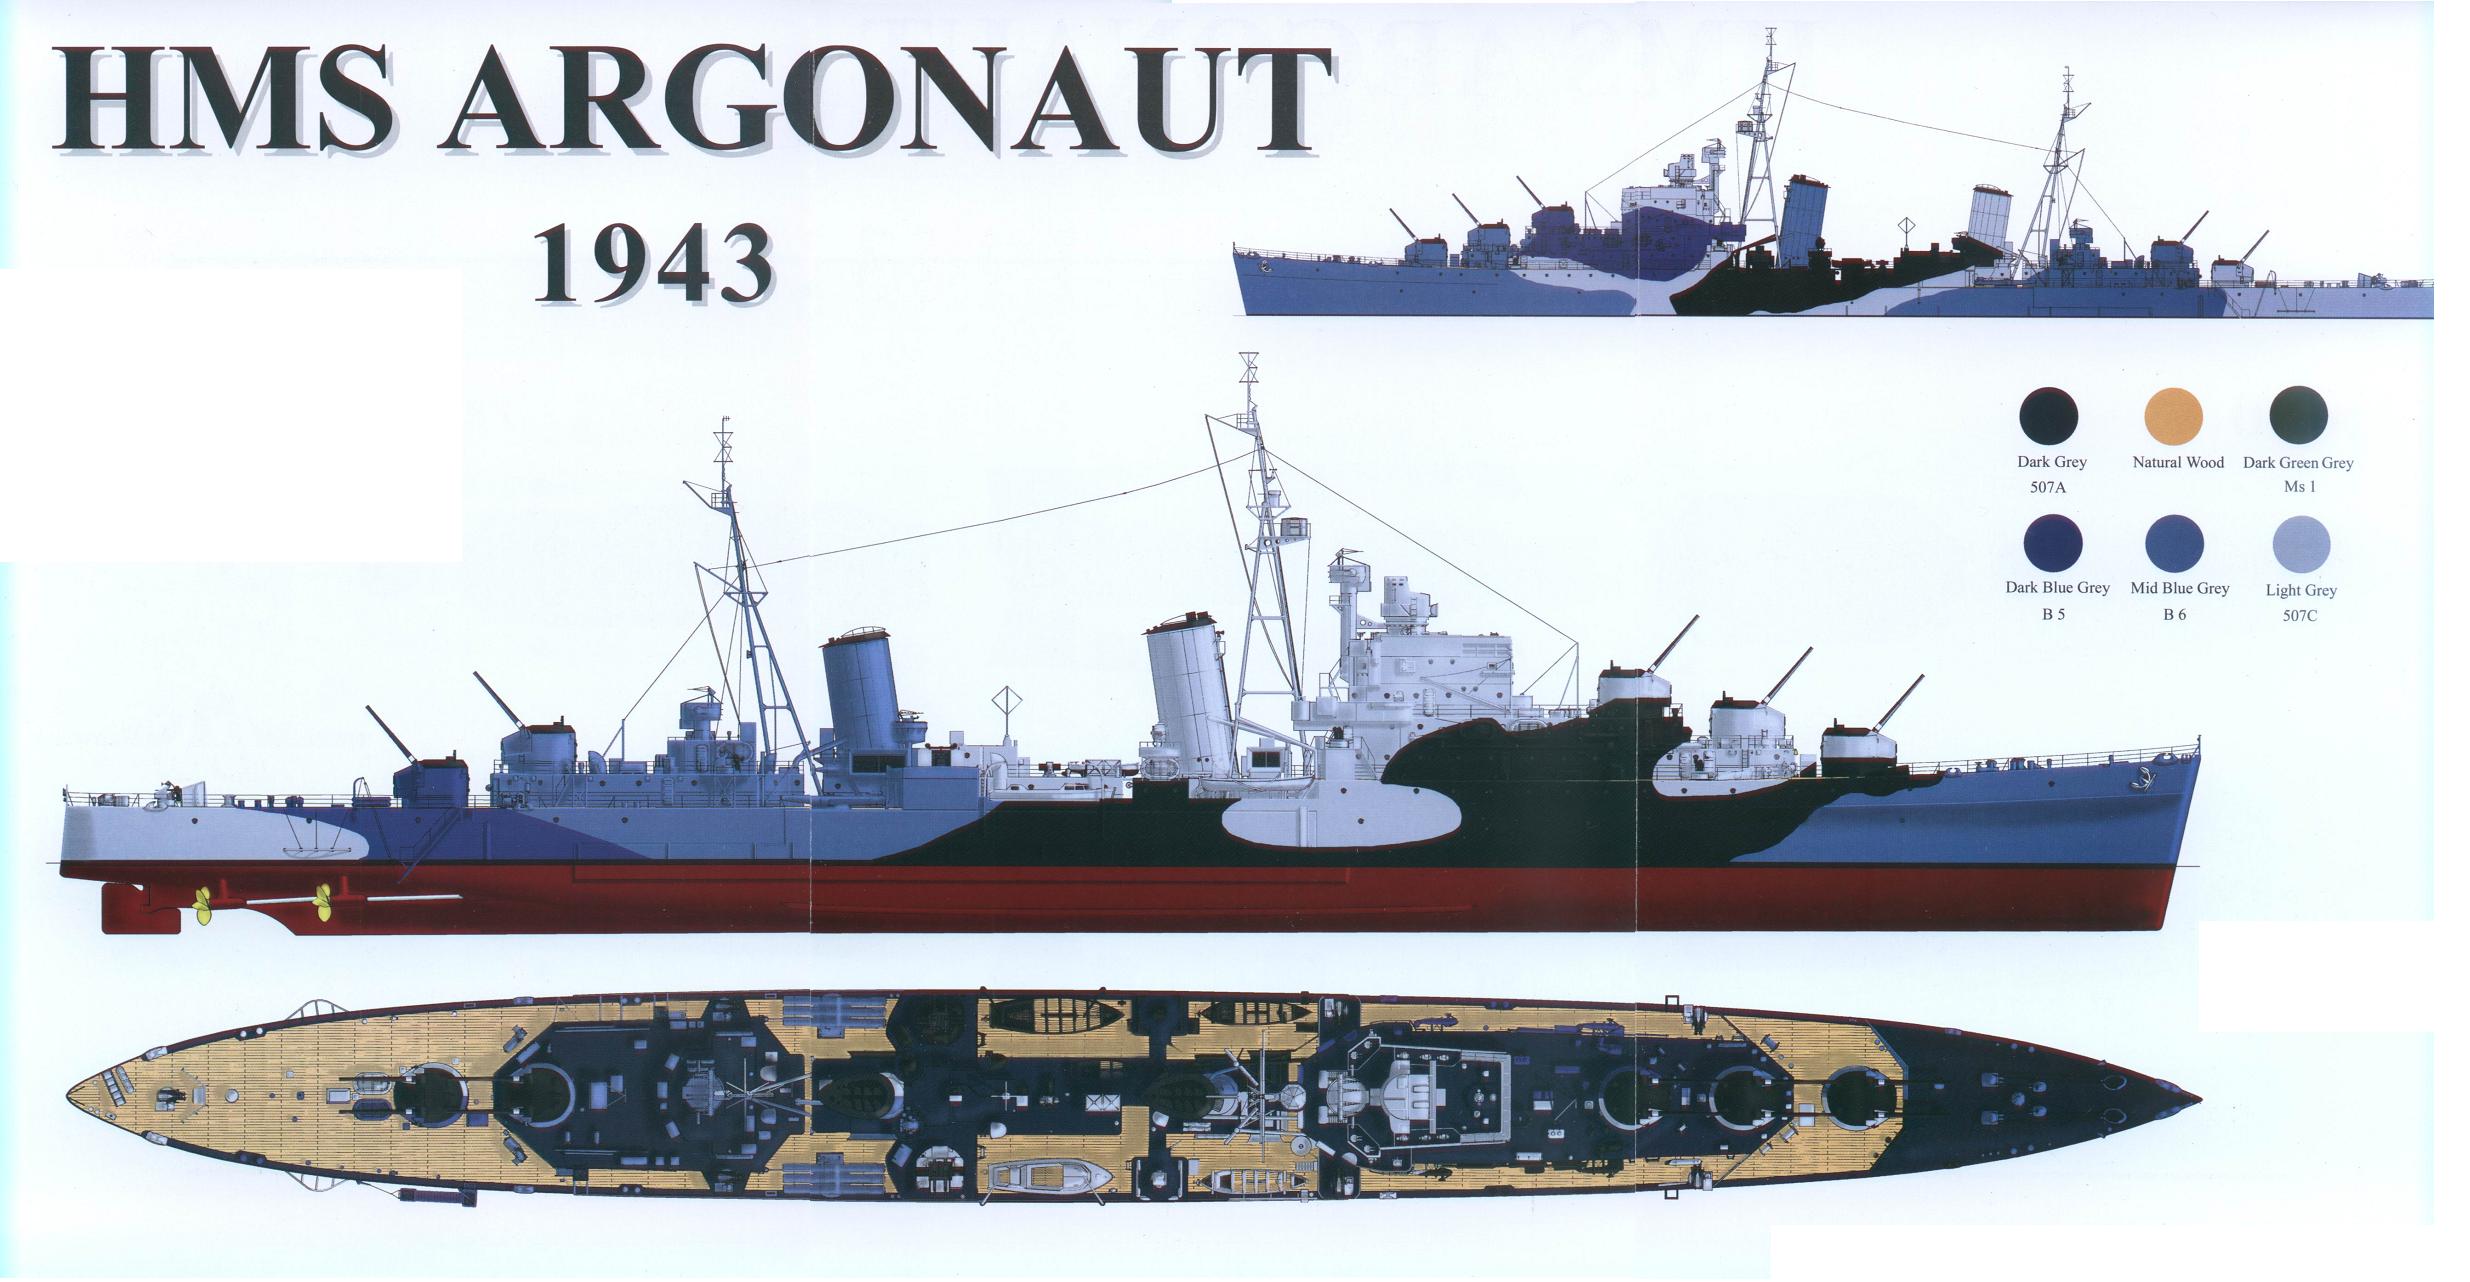 Wwii italy navy battleship roma 1943 plastic model images list - Japanese Battleship Ise Ship Profiles And Diagrams Pinterest Battleship And Ships